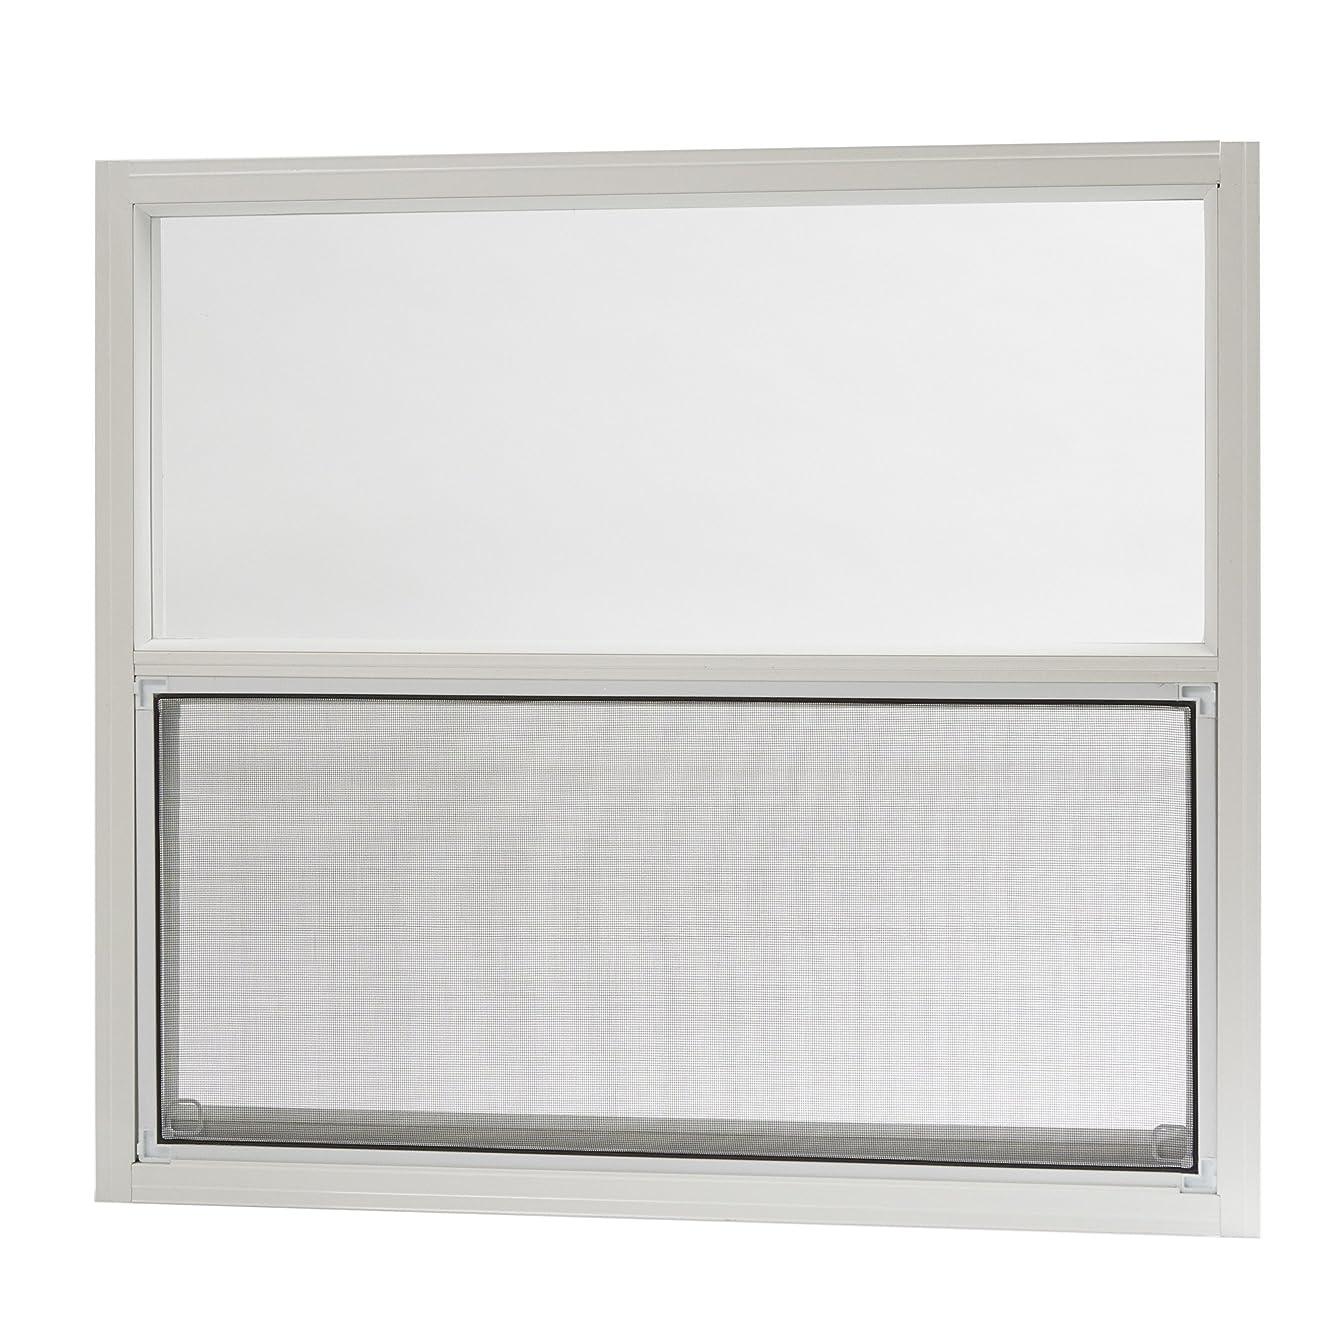 Park Ridge Products AMHW3027PR Park Ridge 30 in. x 27 in. Aluminum Mobile Home Single Hung Window – White,